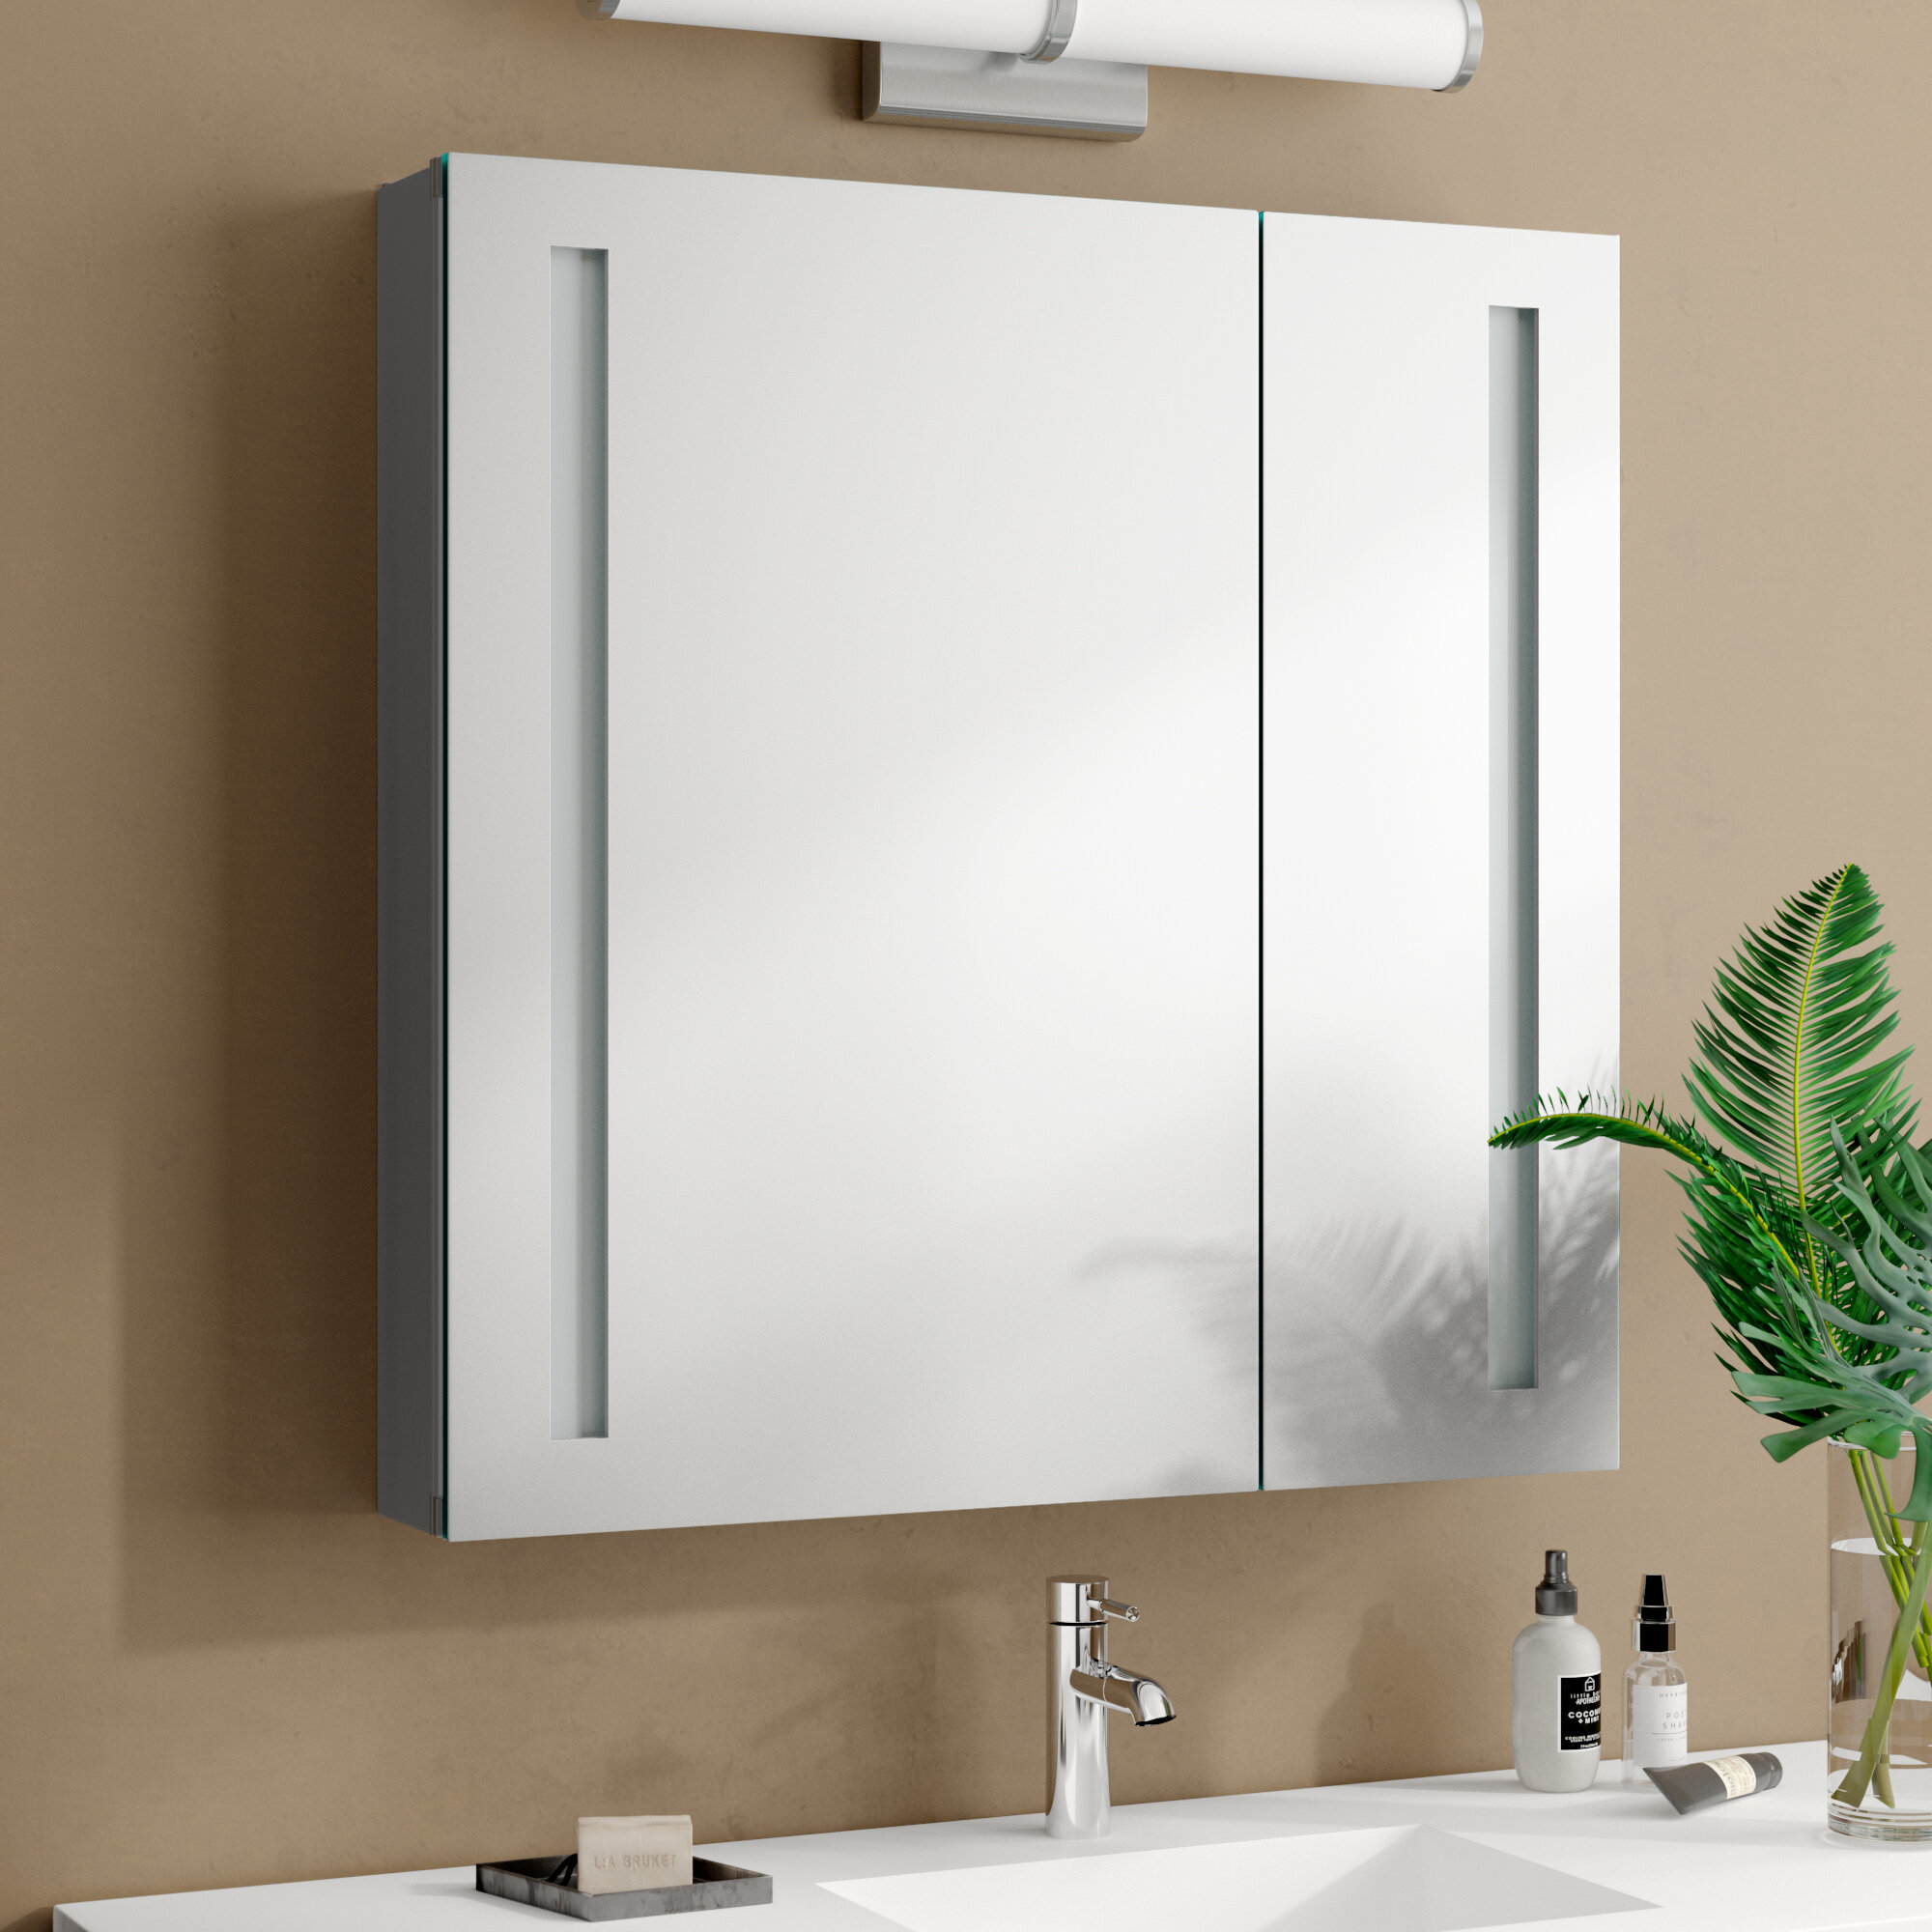 Orren Ellis Dili Recessed Or Surface Mount Frameless 2 Door Medicine Cabinet With 3 Adjustable Shelves And Led Lighting Reviews